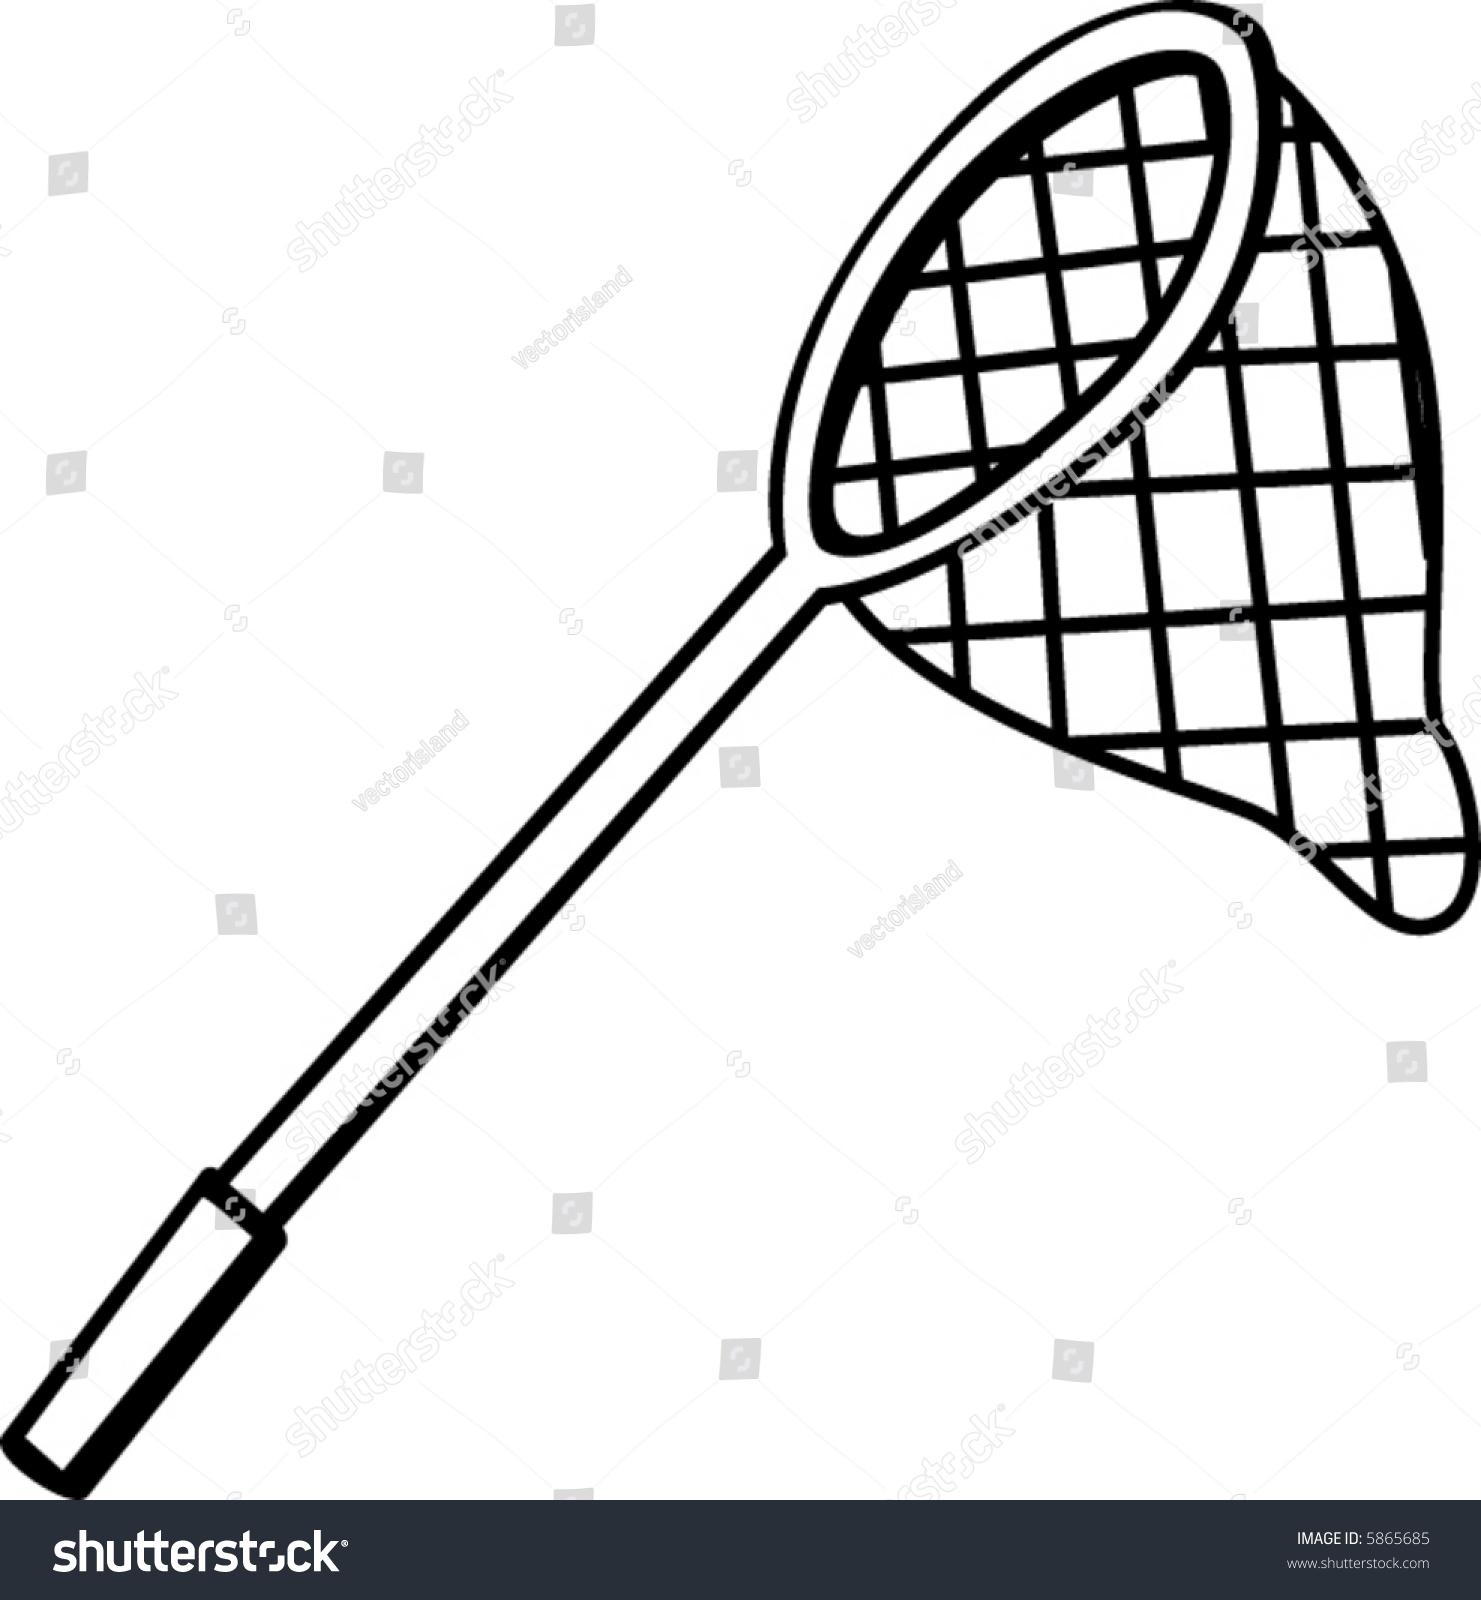 Line Drawing Net : Fishing hunting net stock vector  shutterstock